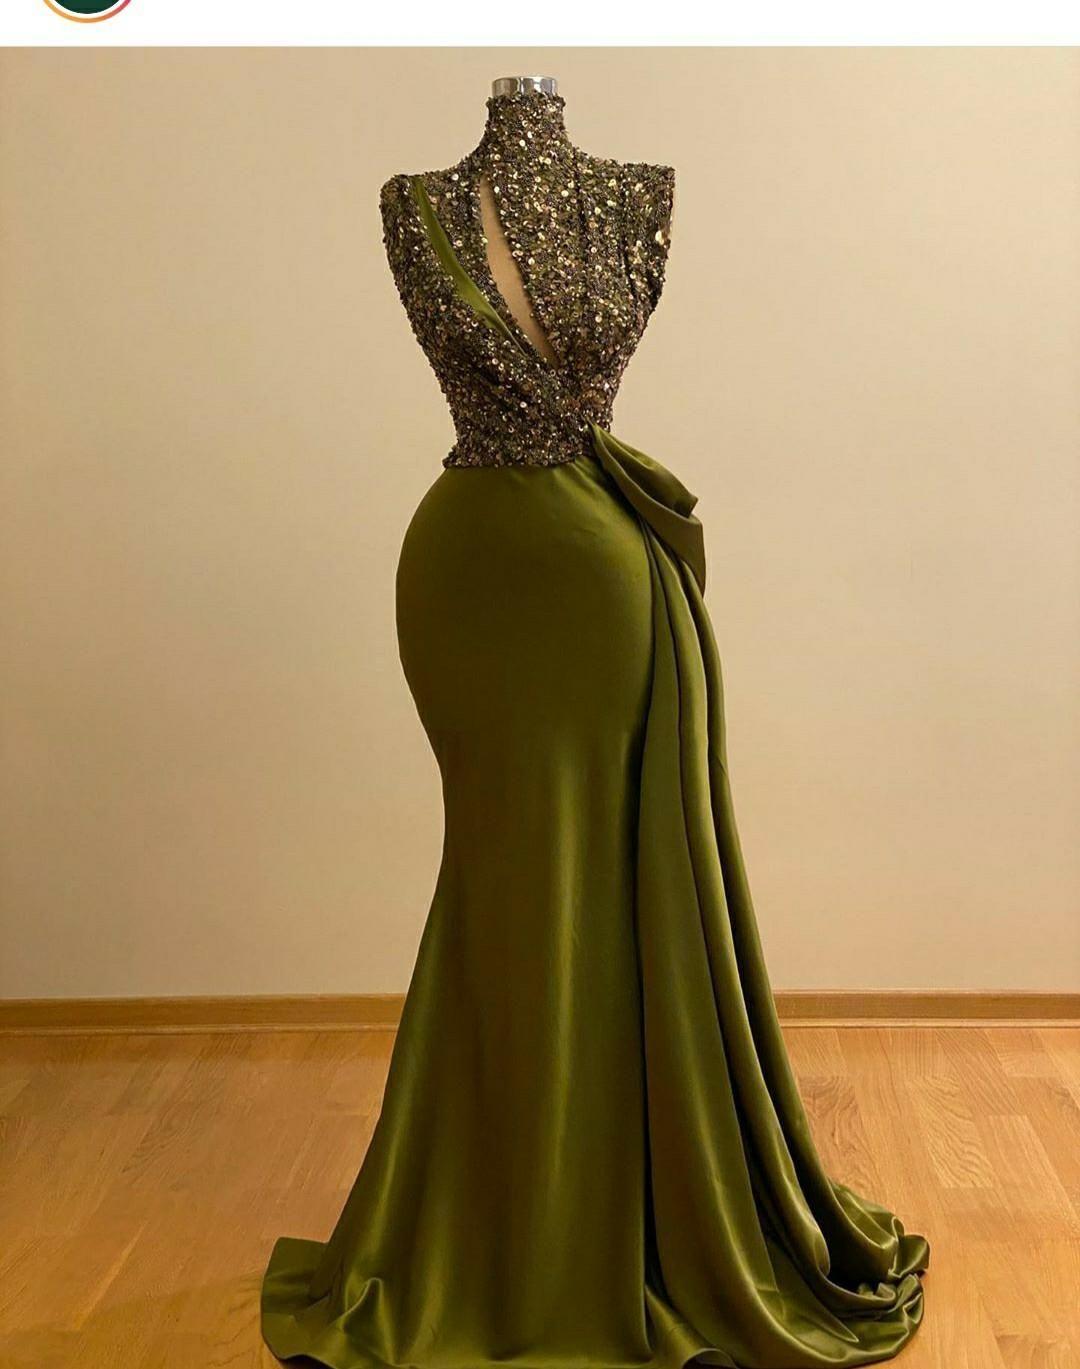 Hunter Green Crystal Beaded Sirena Vestidos de prom Playa Vintage Alto Cuello Vestido Vestido Arabe Saudita Largo Formal Vestido